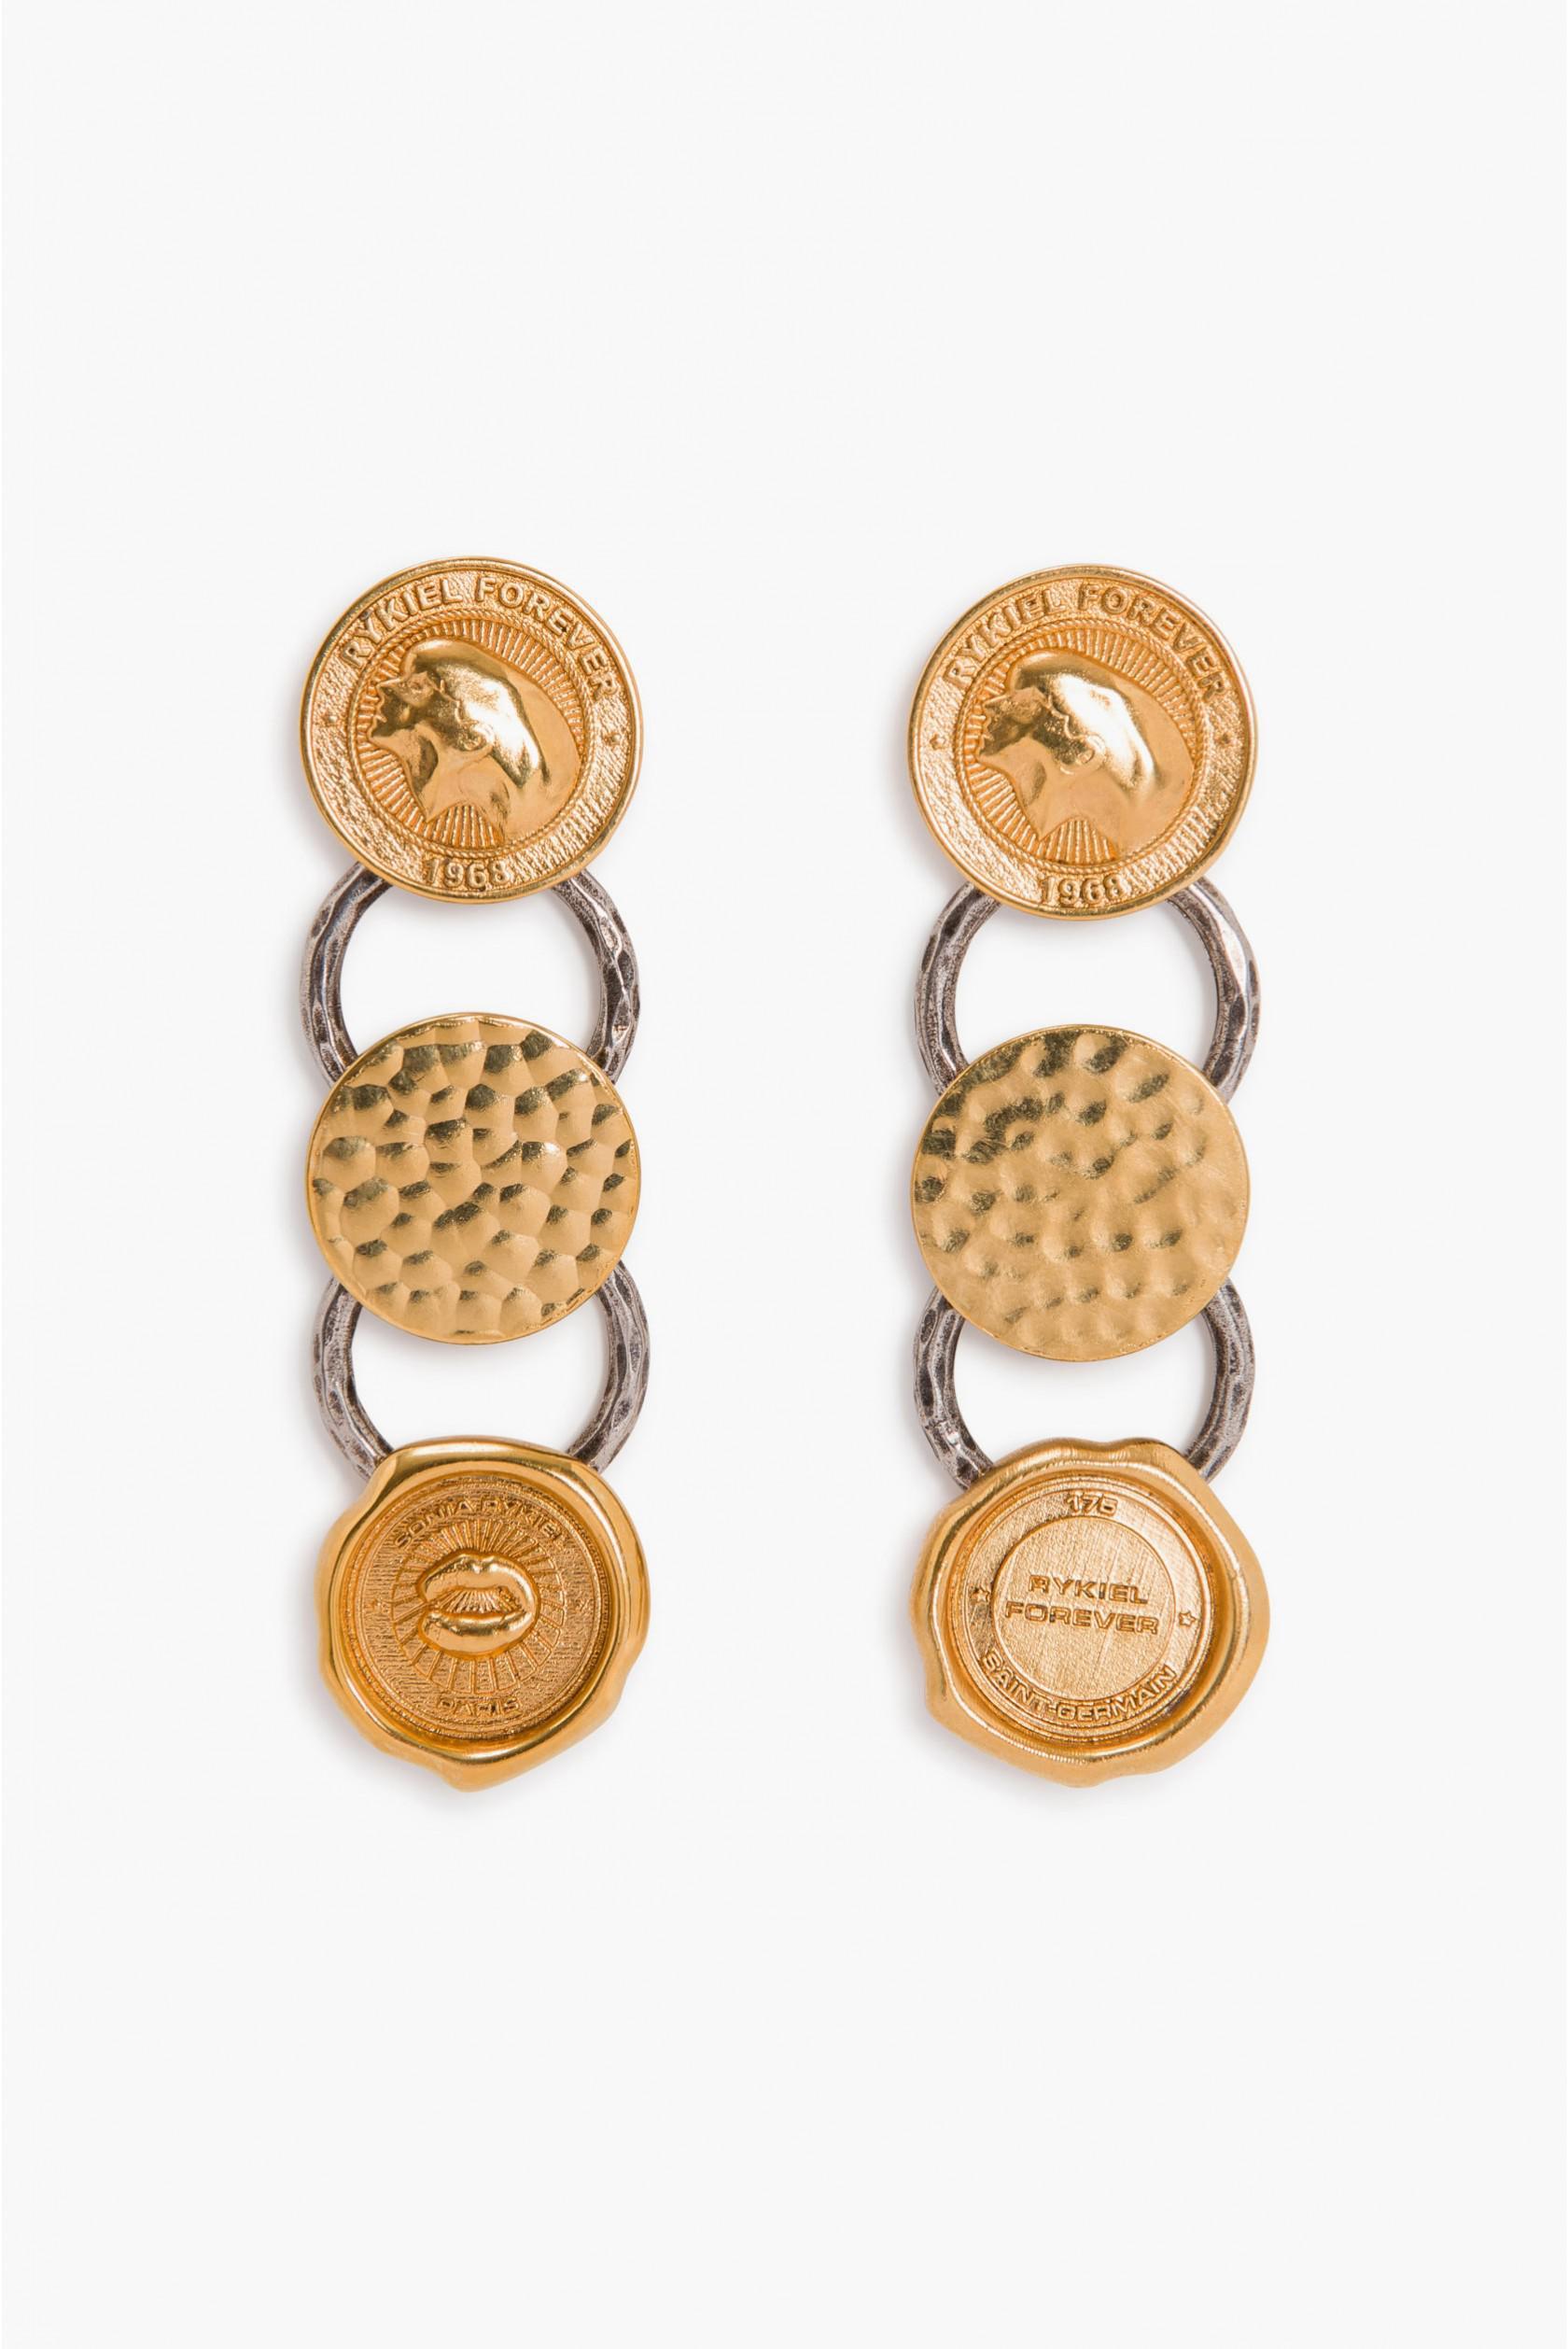 Sonia Rykiel Coin Earrings 2rNhozC4i